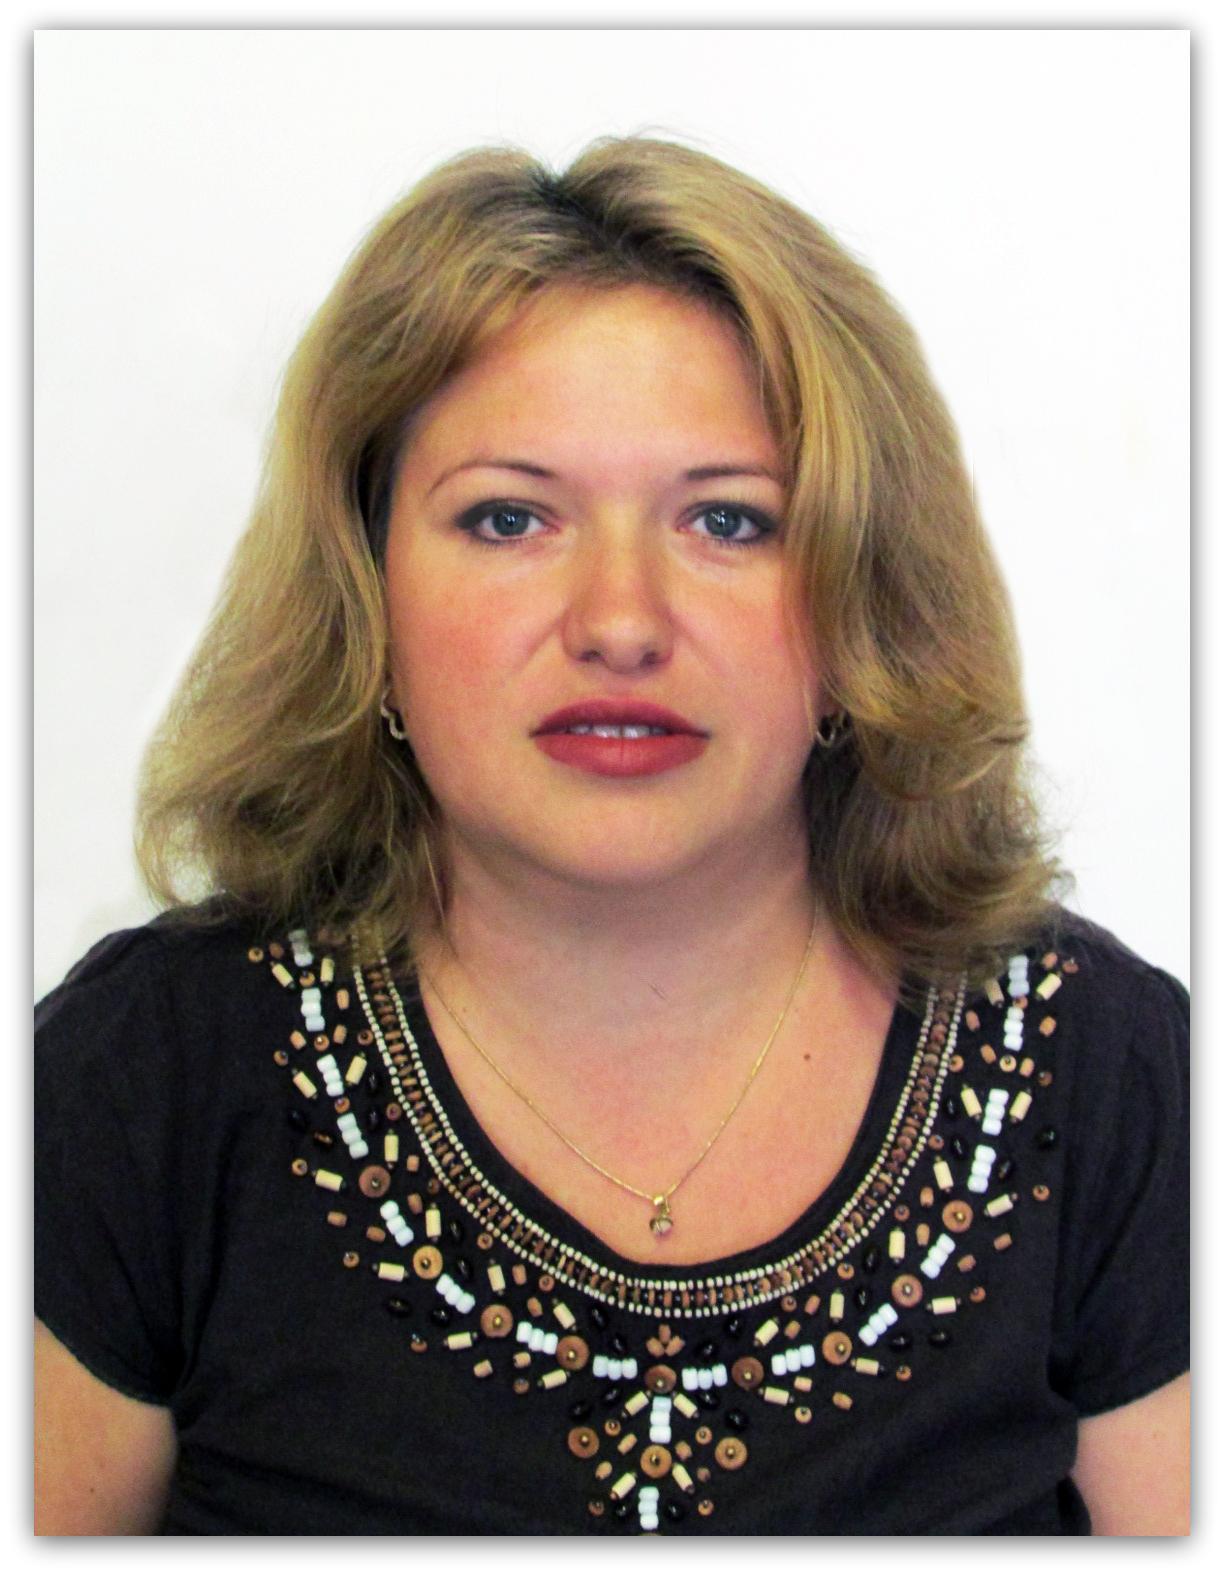 poza CV 2013 Cristina Geana